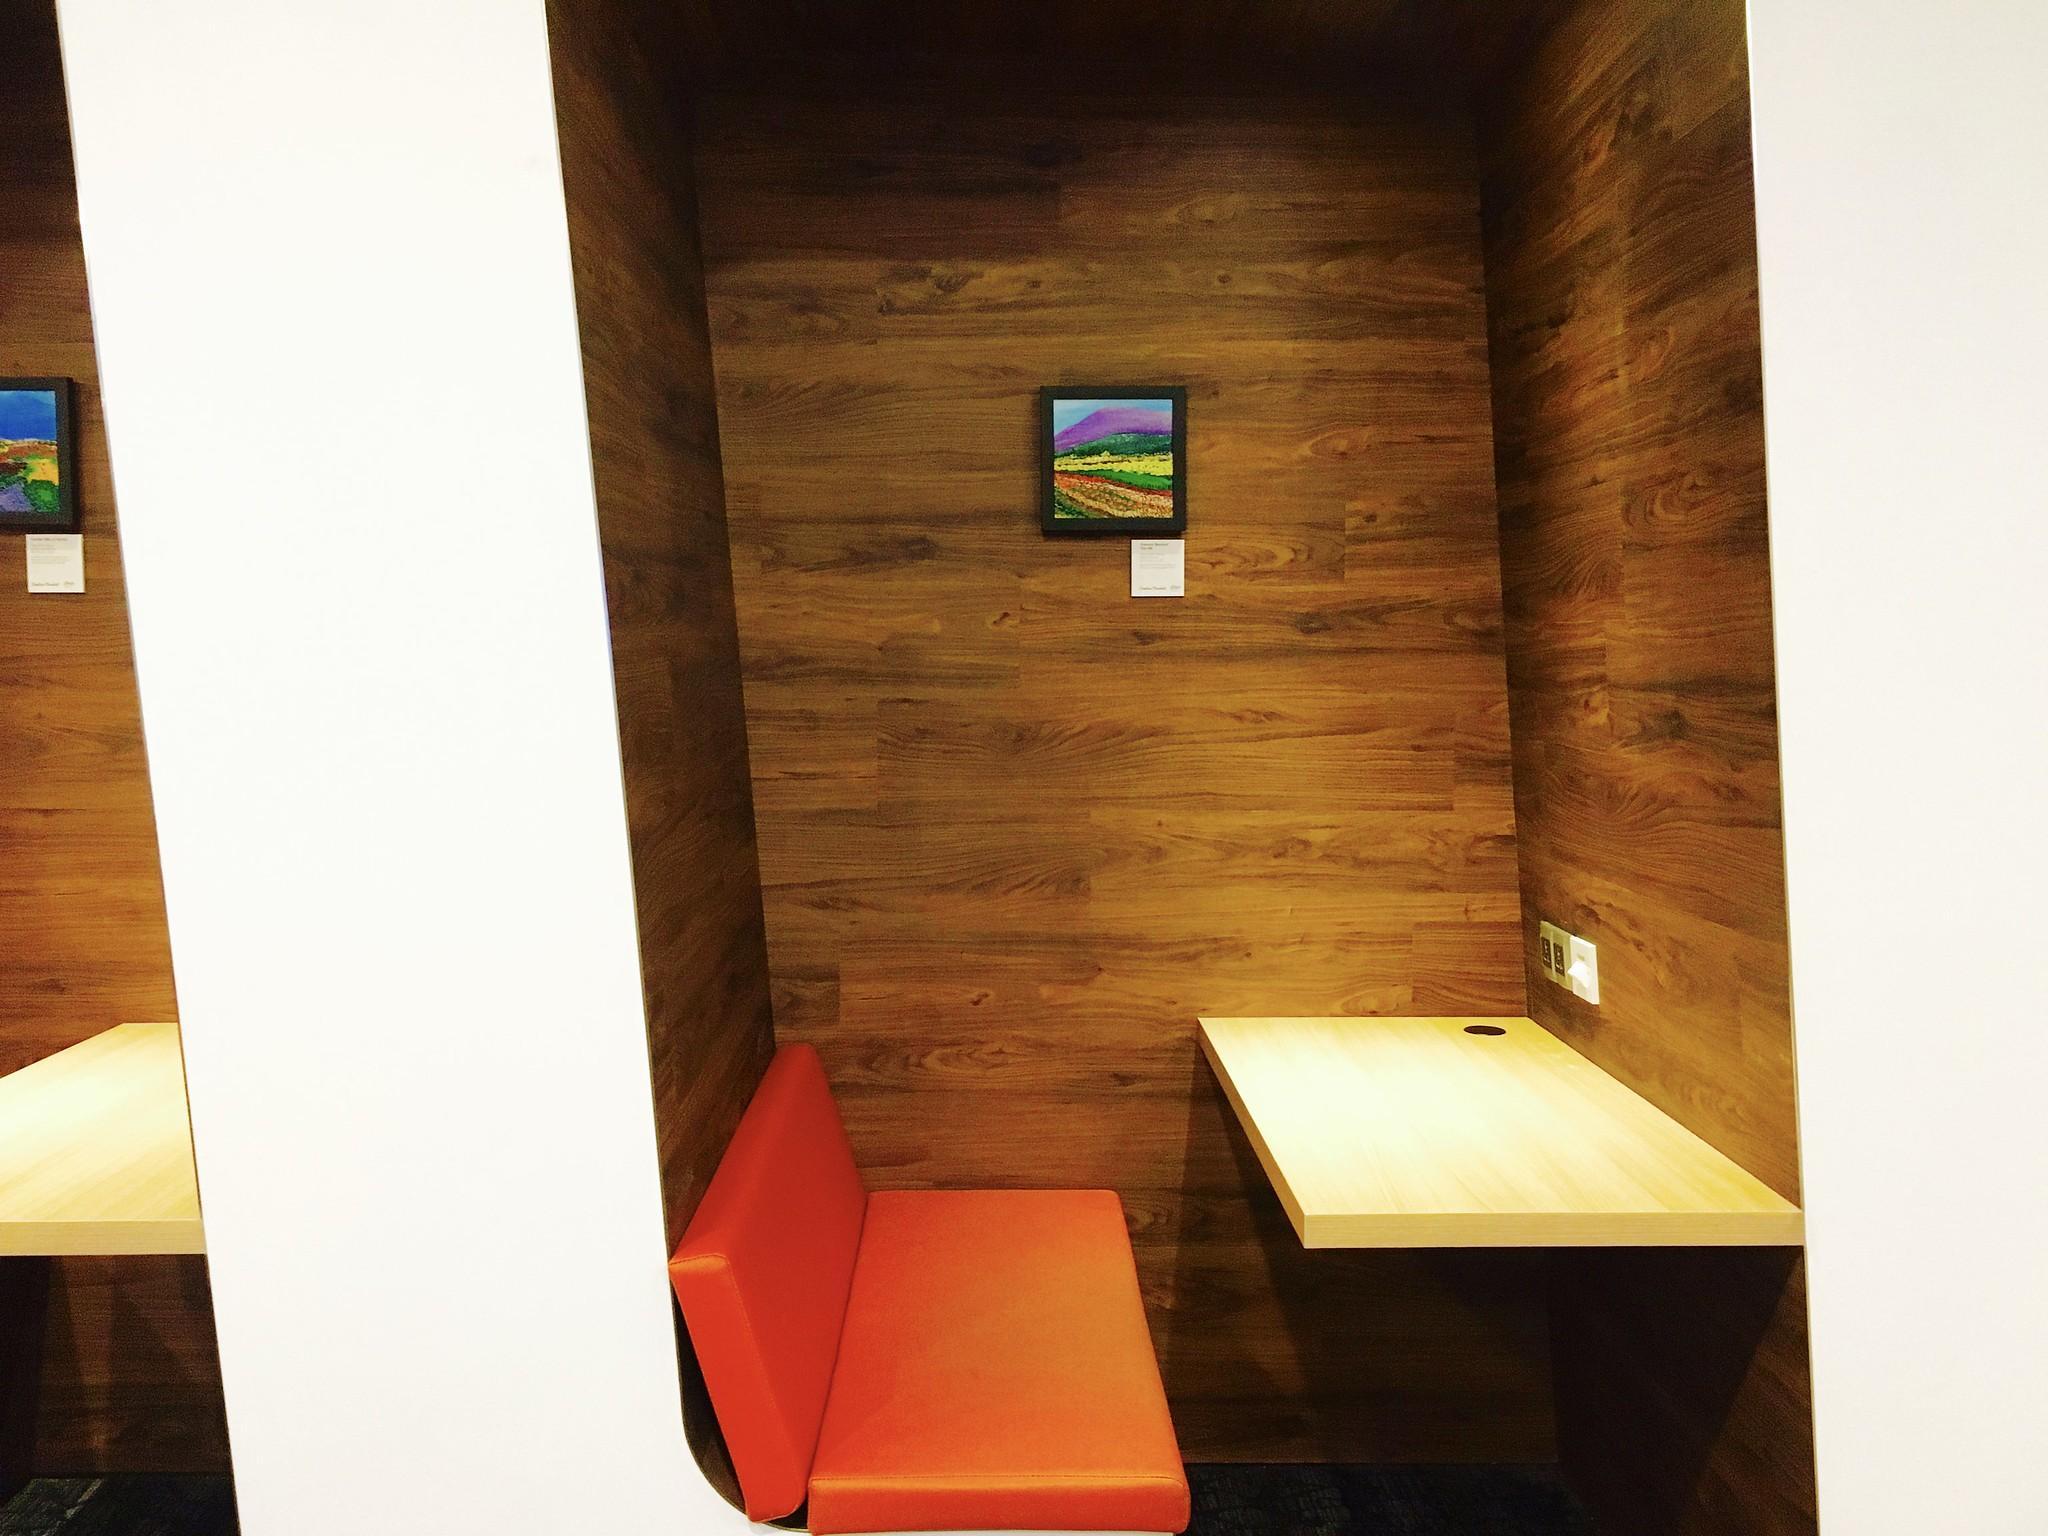 Singapore Changi Airport T1 SATS Premier Lounge